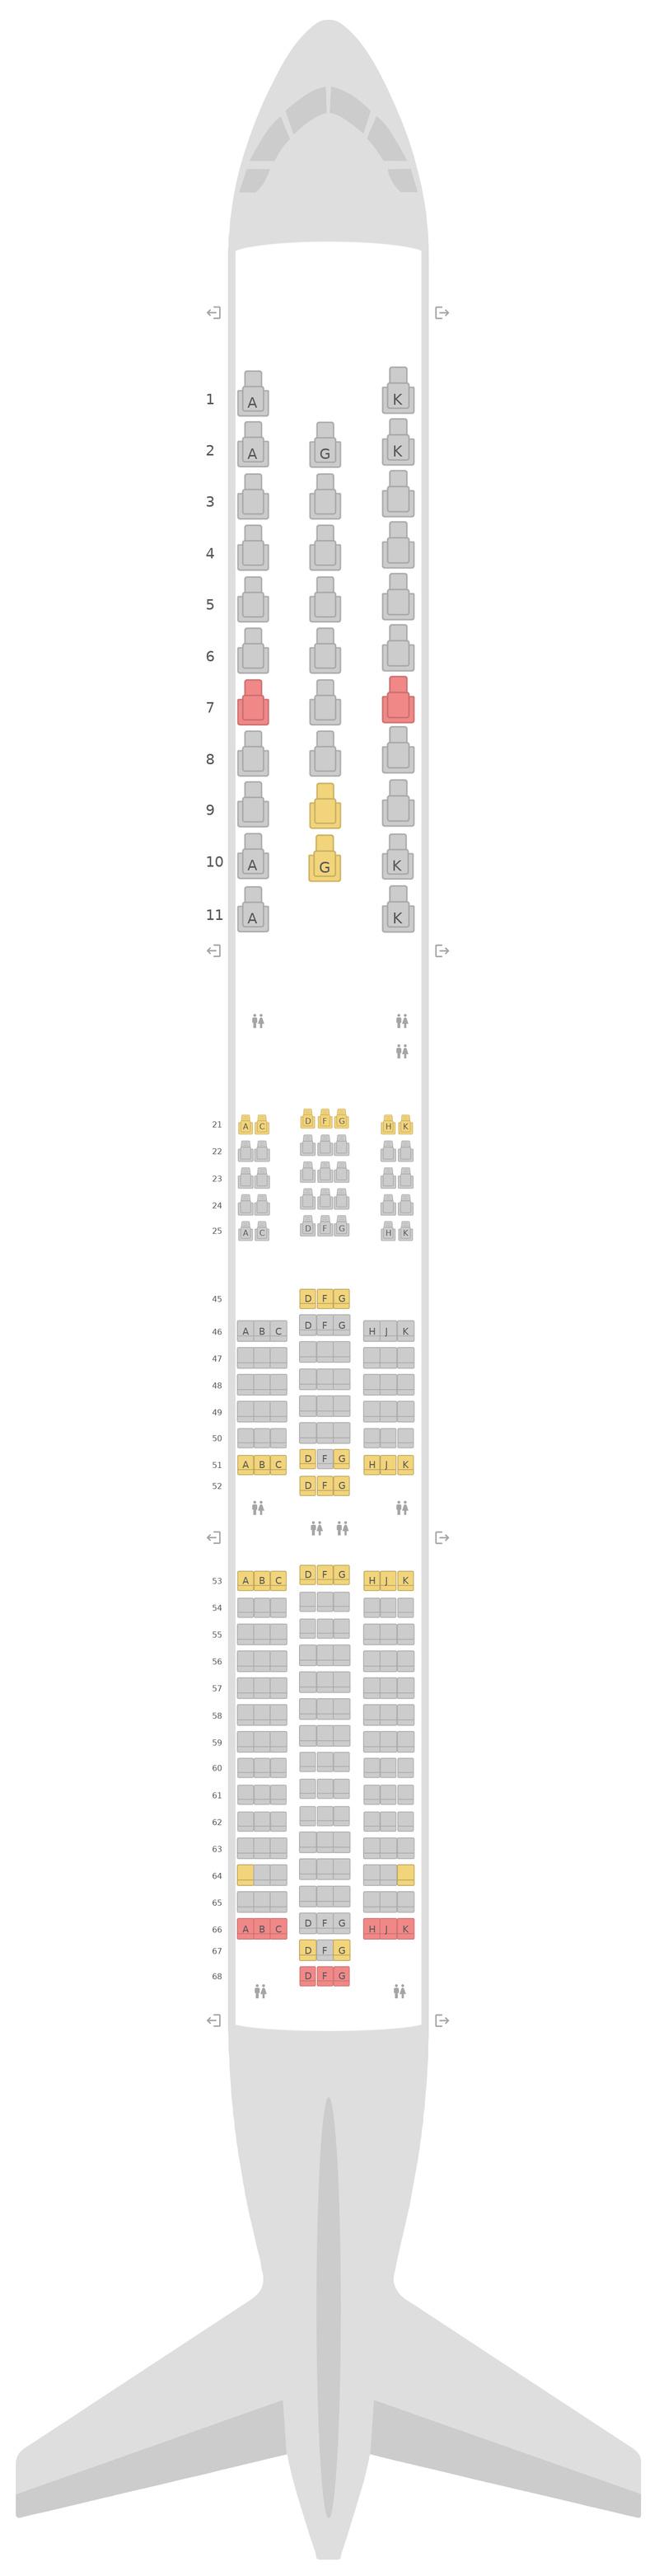 Seat Map Virgin Atlantic Boeing 787-9 (789)